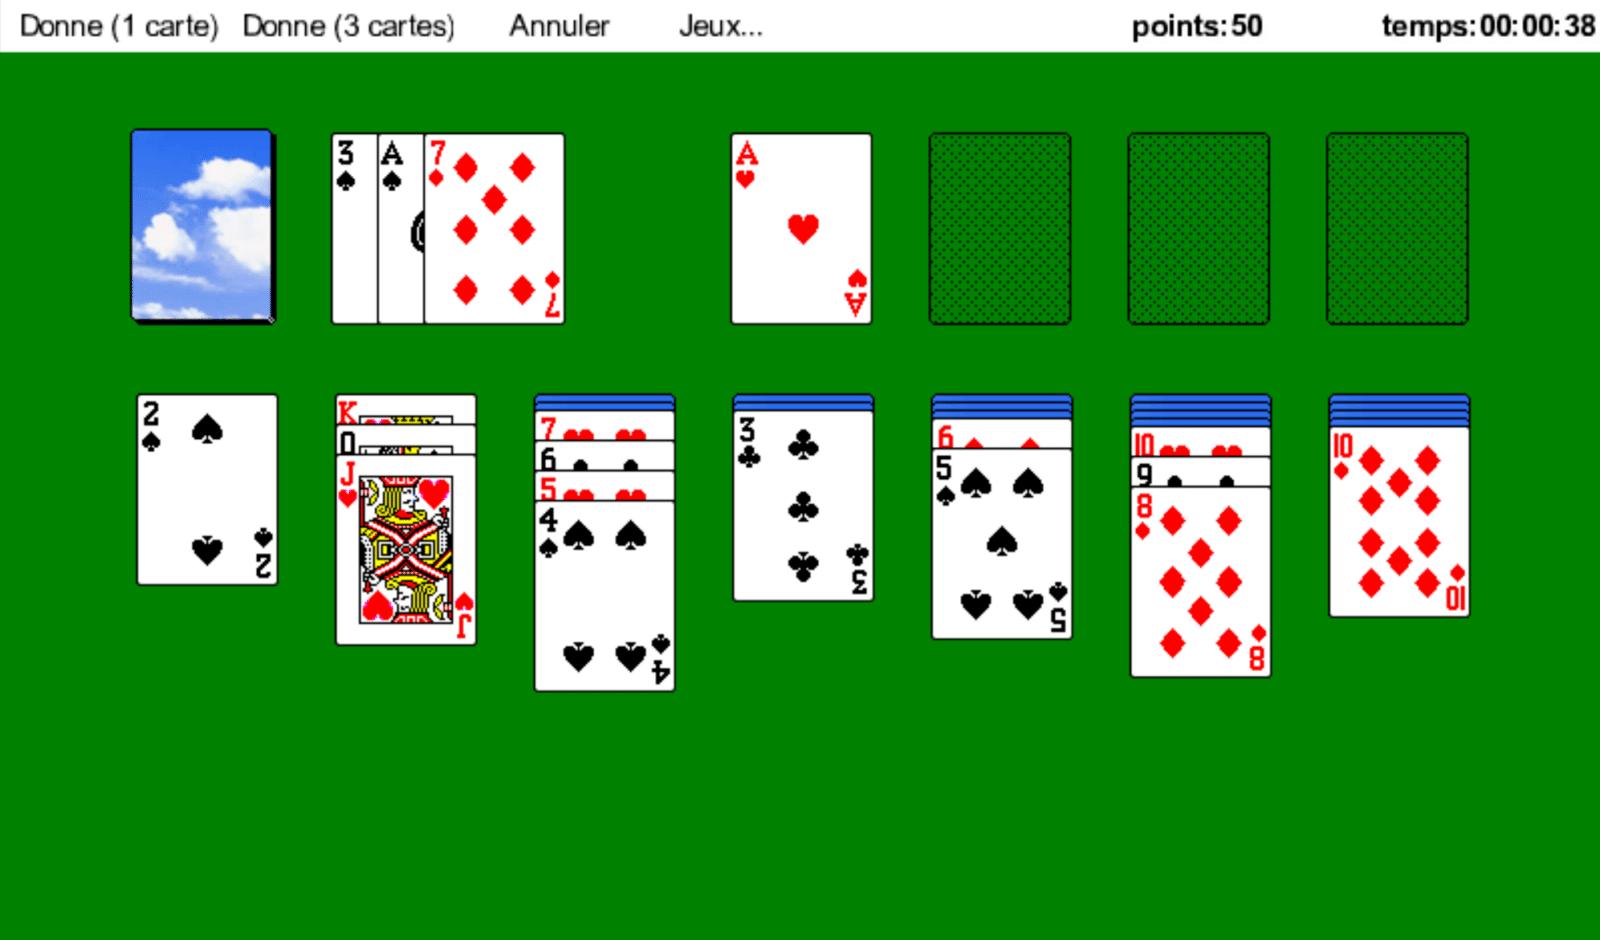 Tableau de jeu - Solitaire Microsoft Windows XP